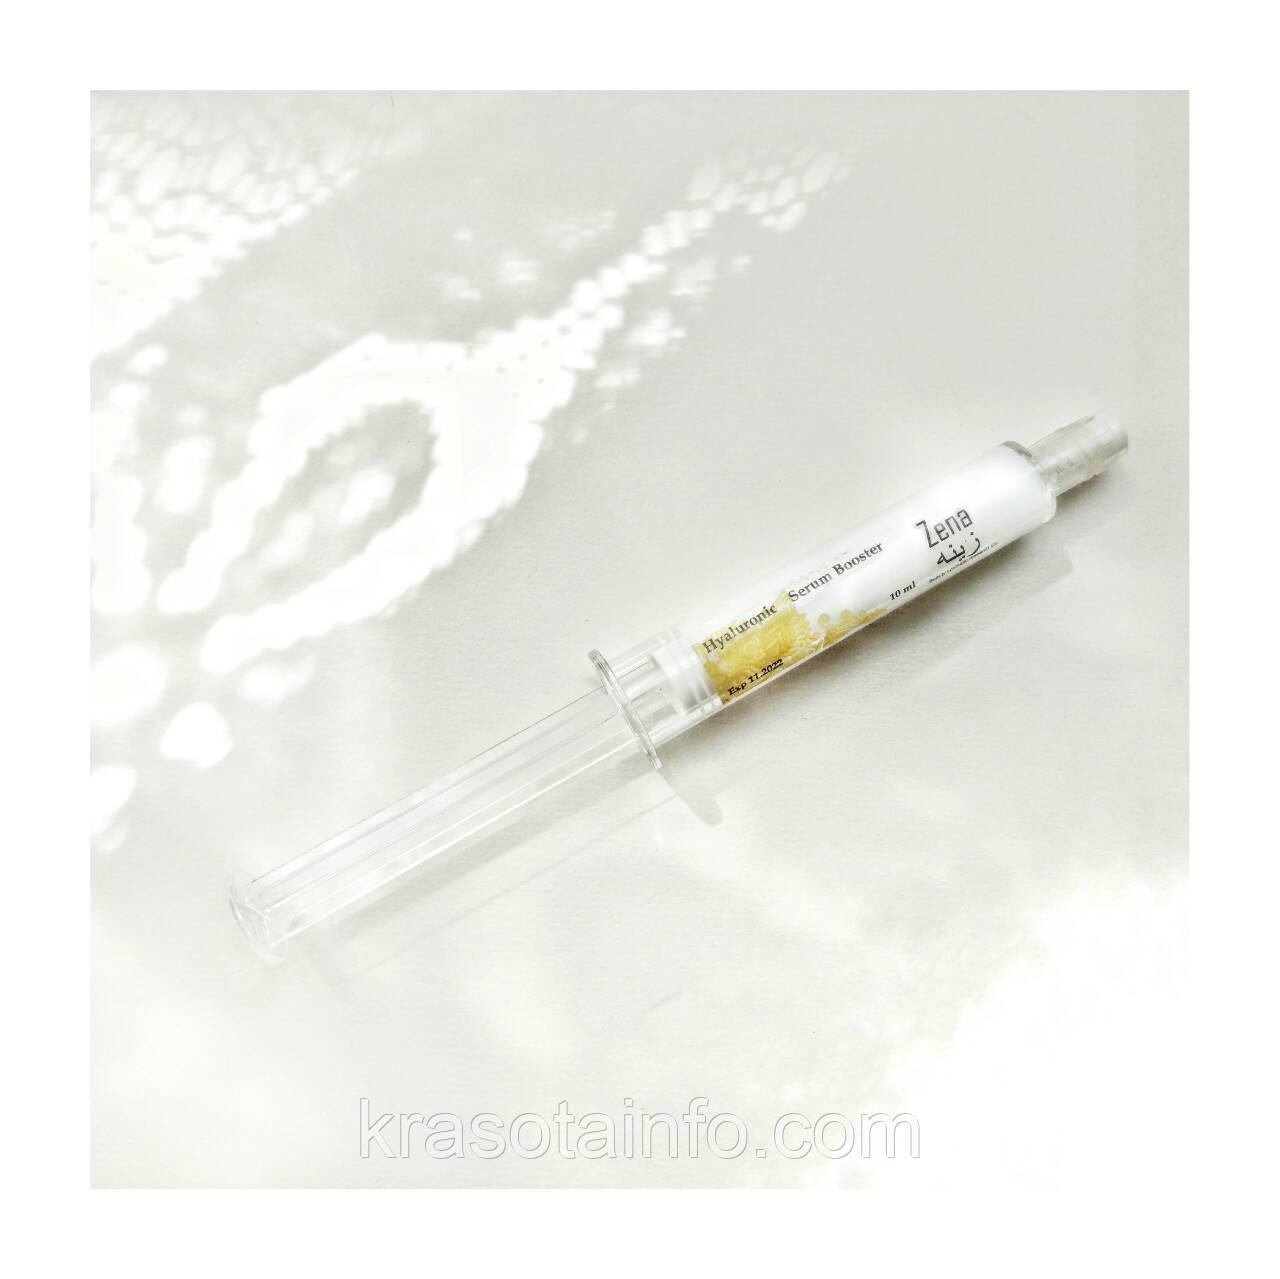 Концентрат под дермаштамп Гиалуроновый бустер - серум Zena  Hyaluronic serum booster, 10 мл